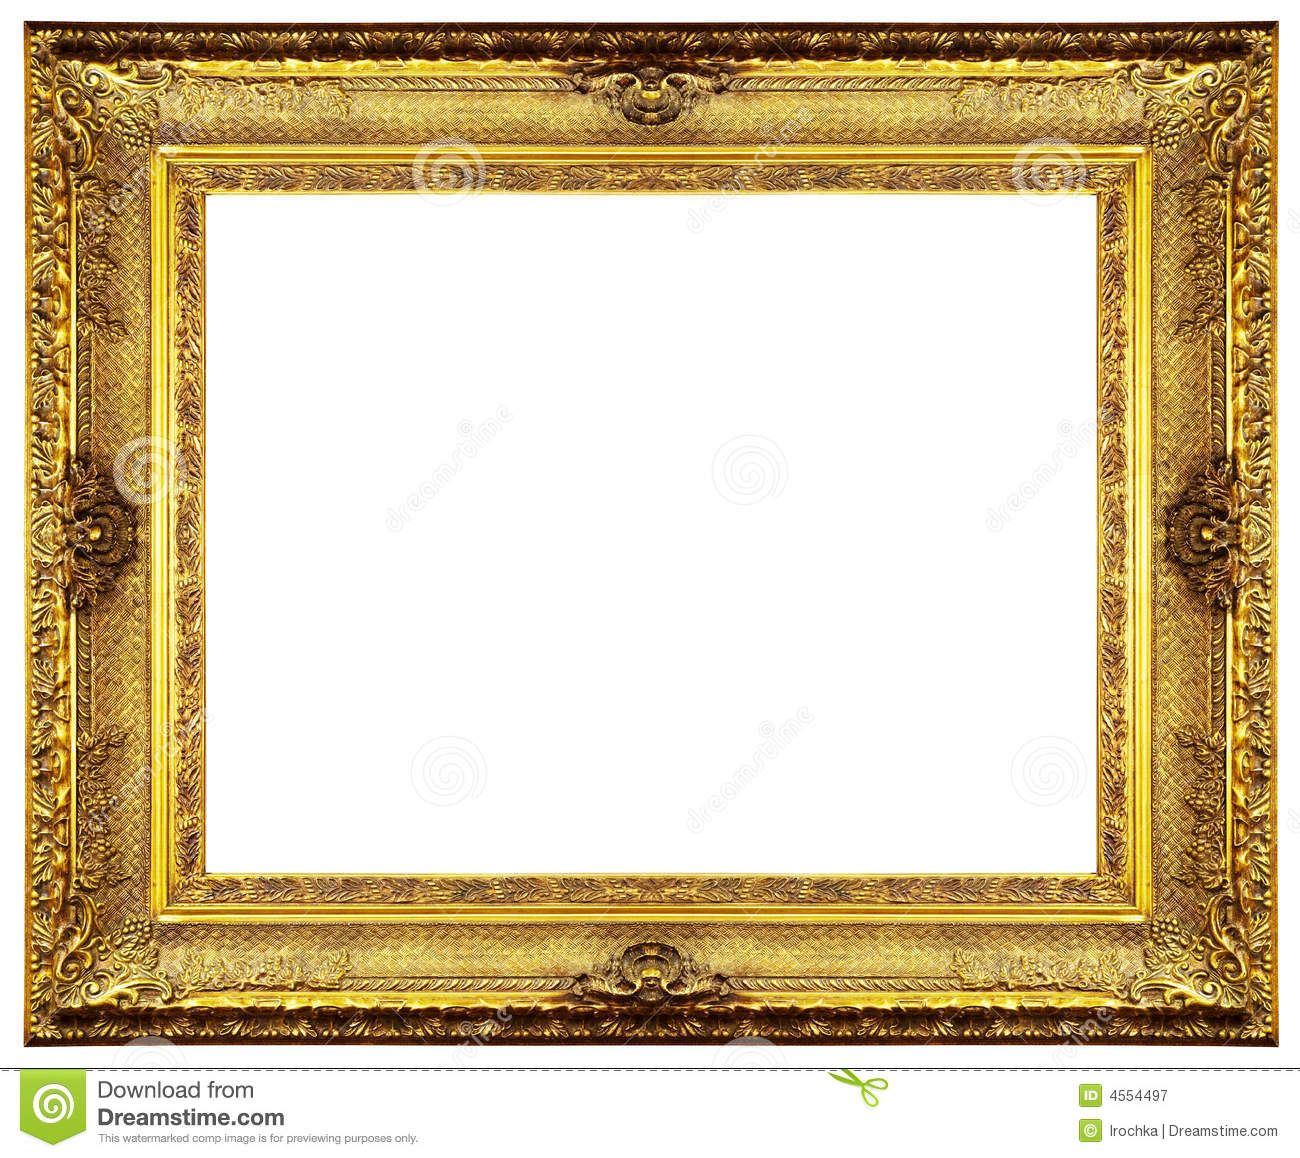 Antique gold frame clipart